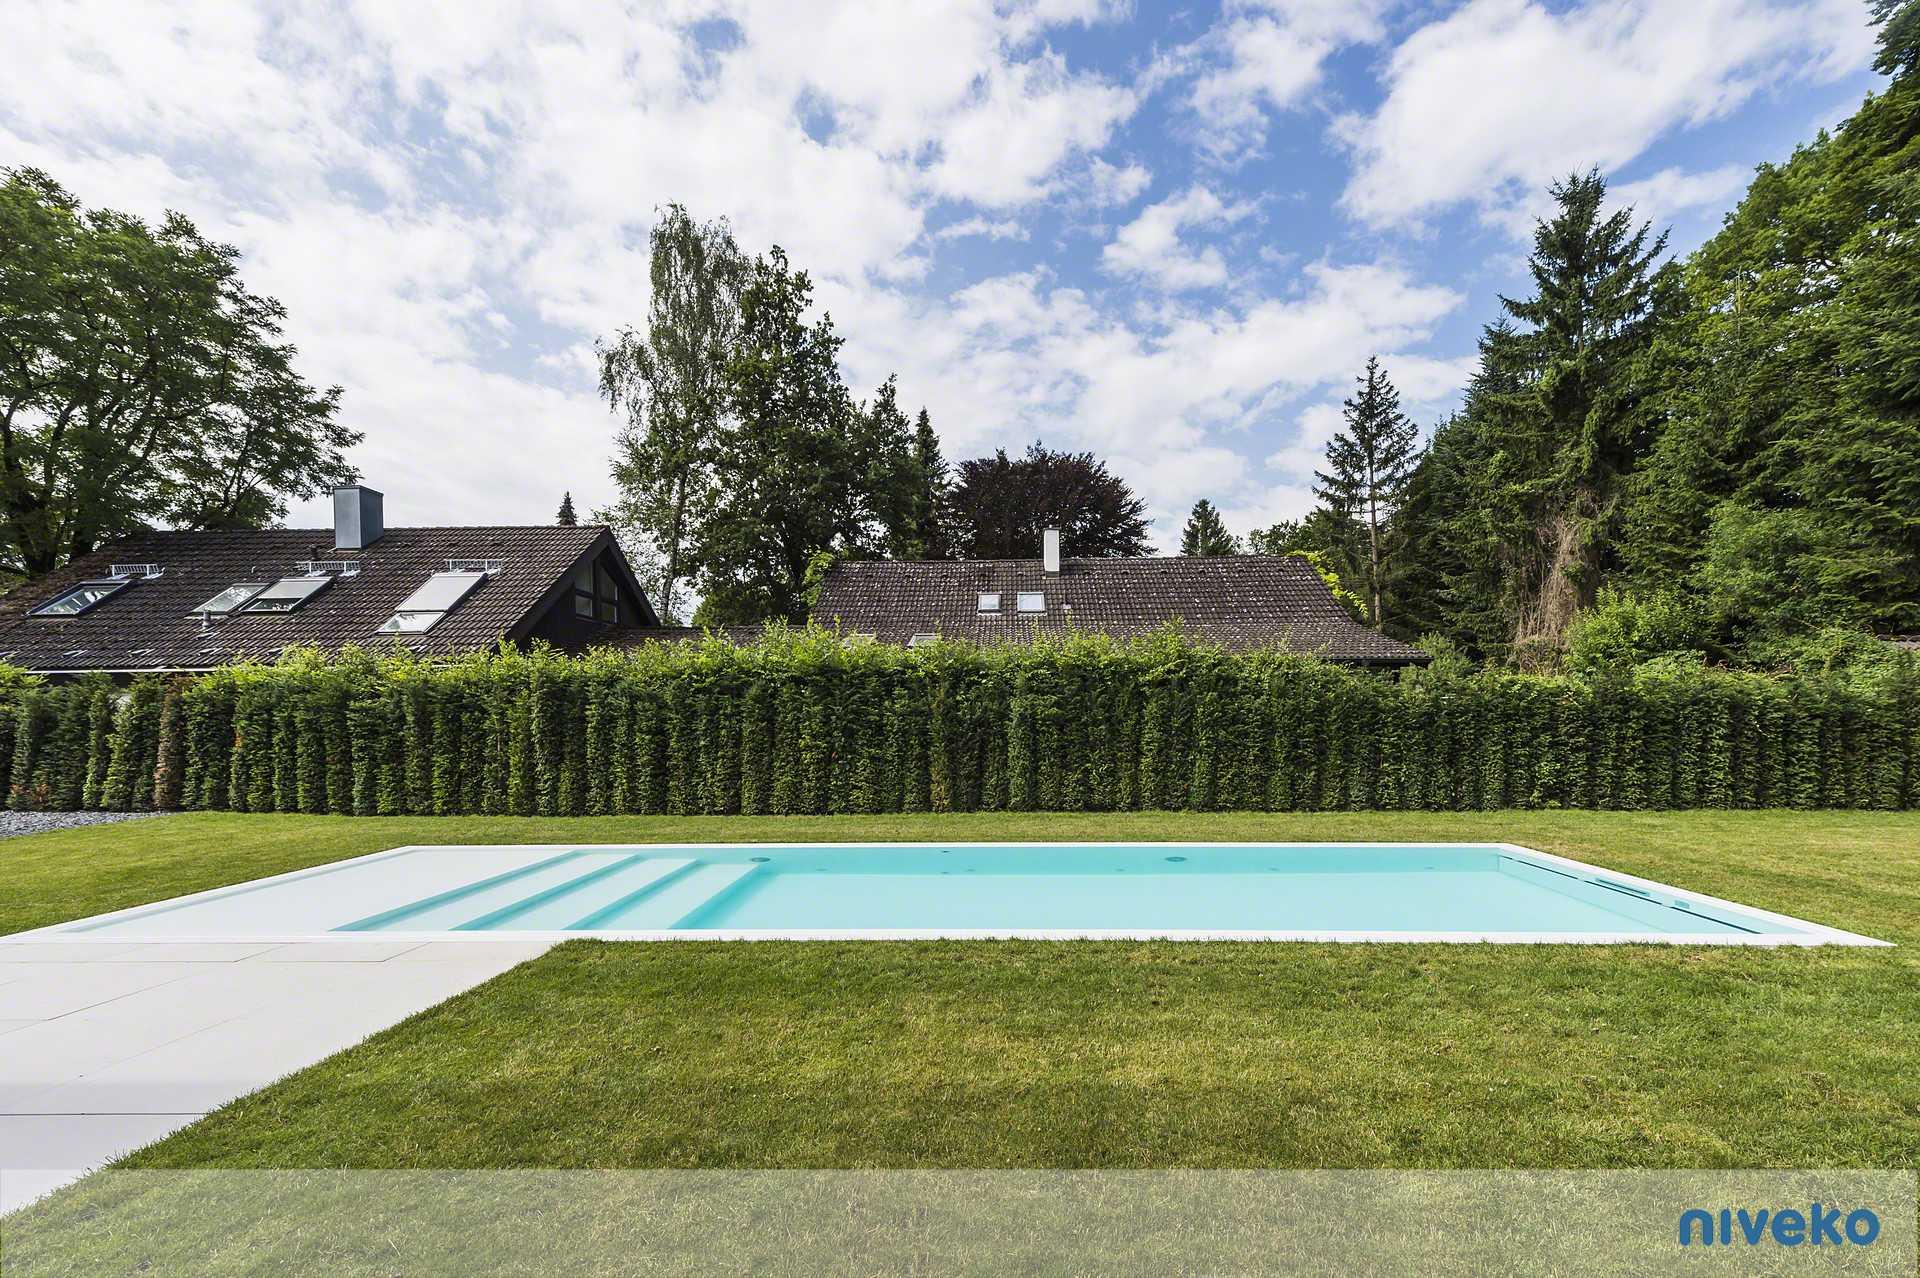 Niveko Advance Pool - Schwimmbadbau Tirol